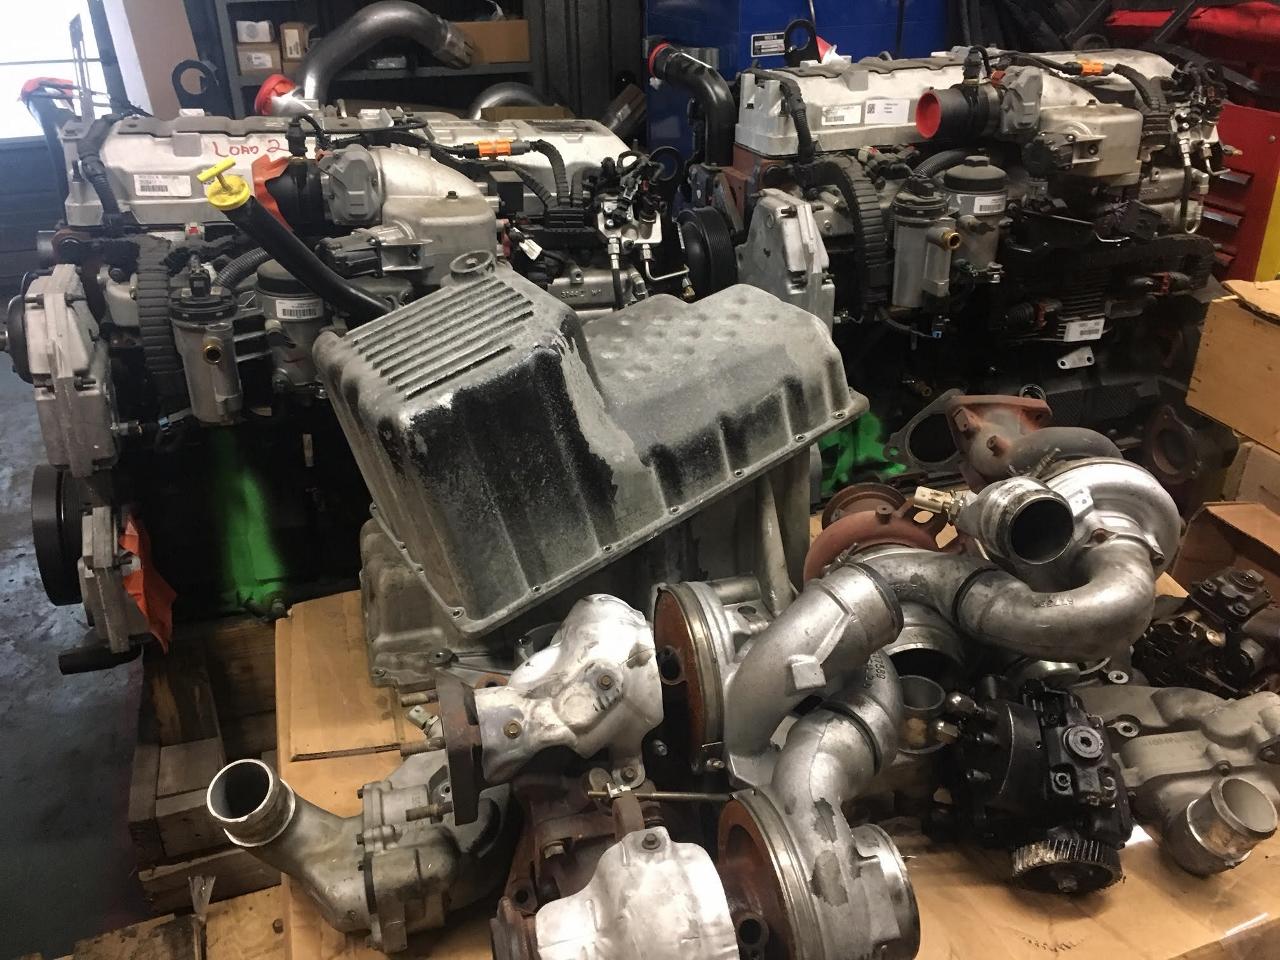 engines2 (1280x960)